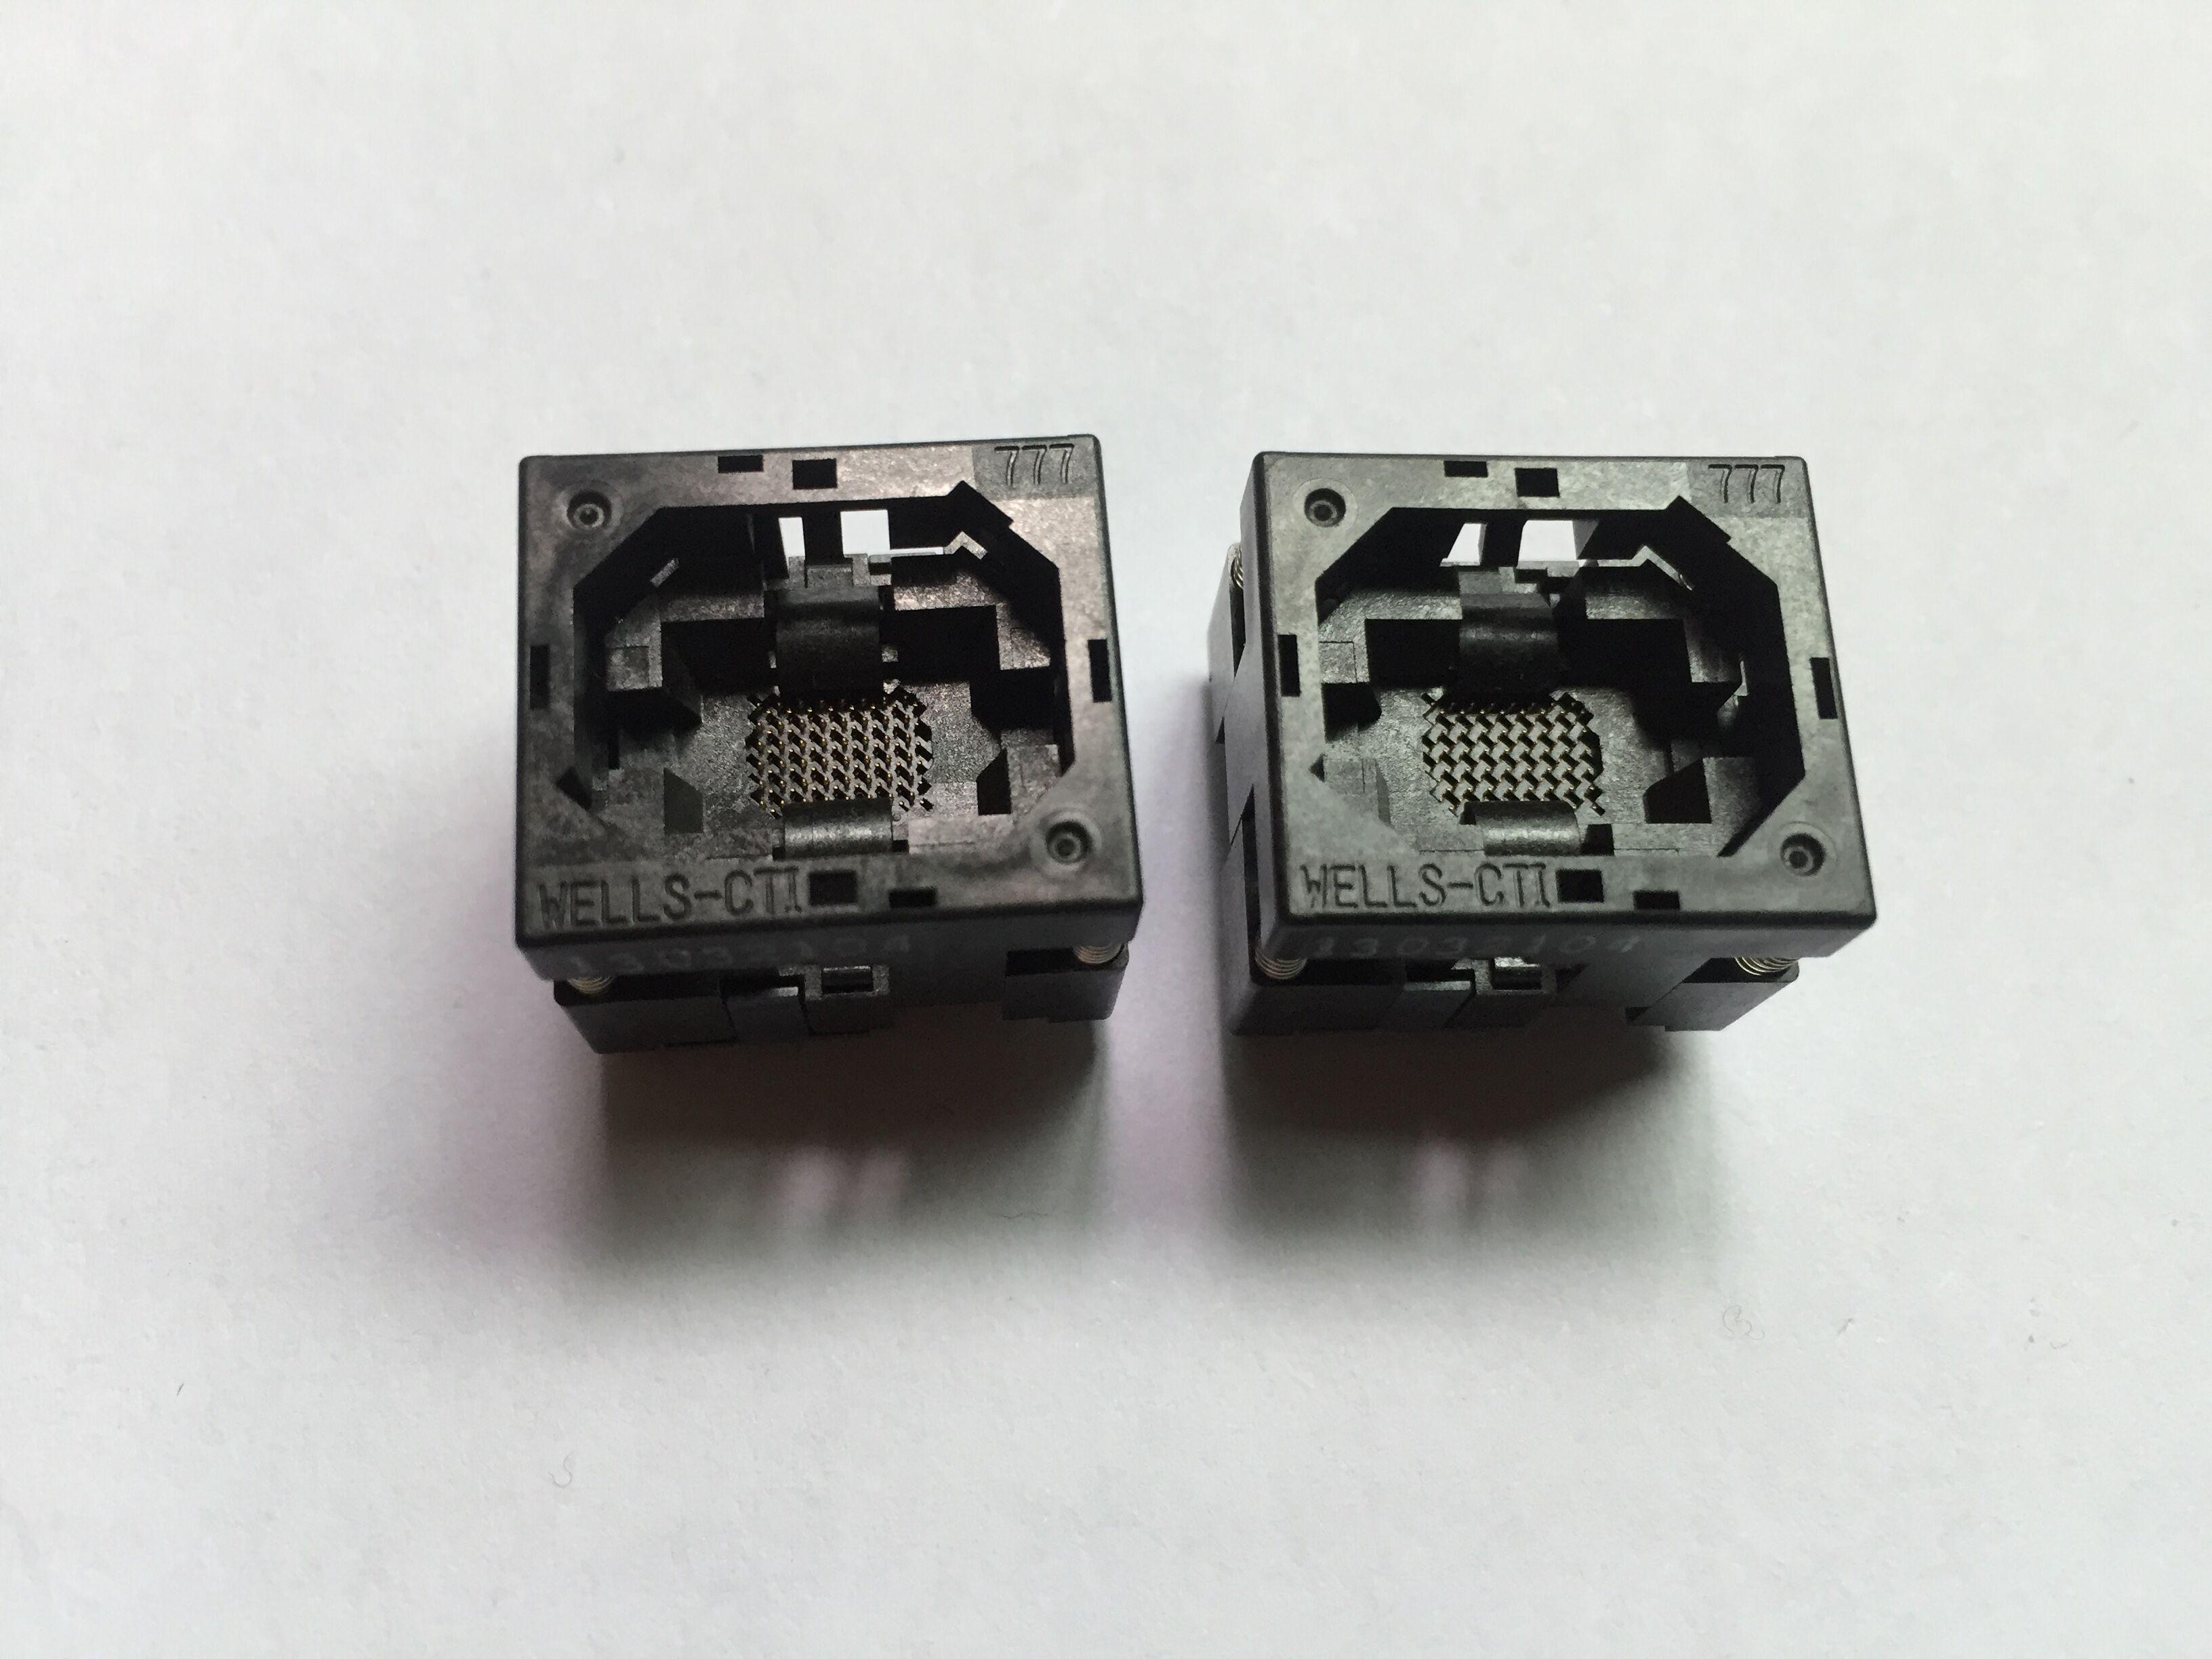 Wells CSP soket Soket 777A1048H111C BGA48Pin 0.8mm Pitch 8.15x6.15mm Burn'ü sıkıştırın